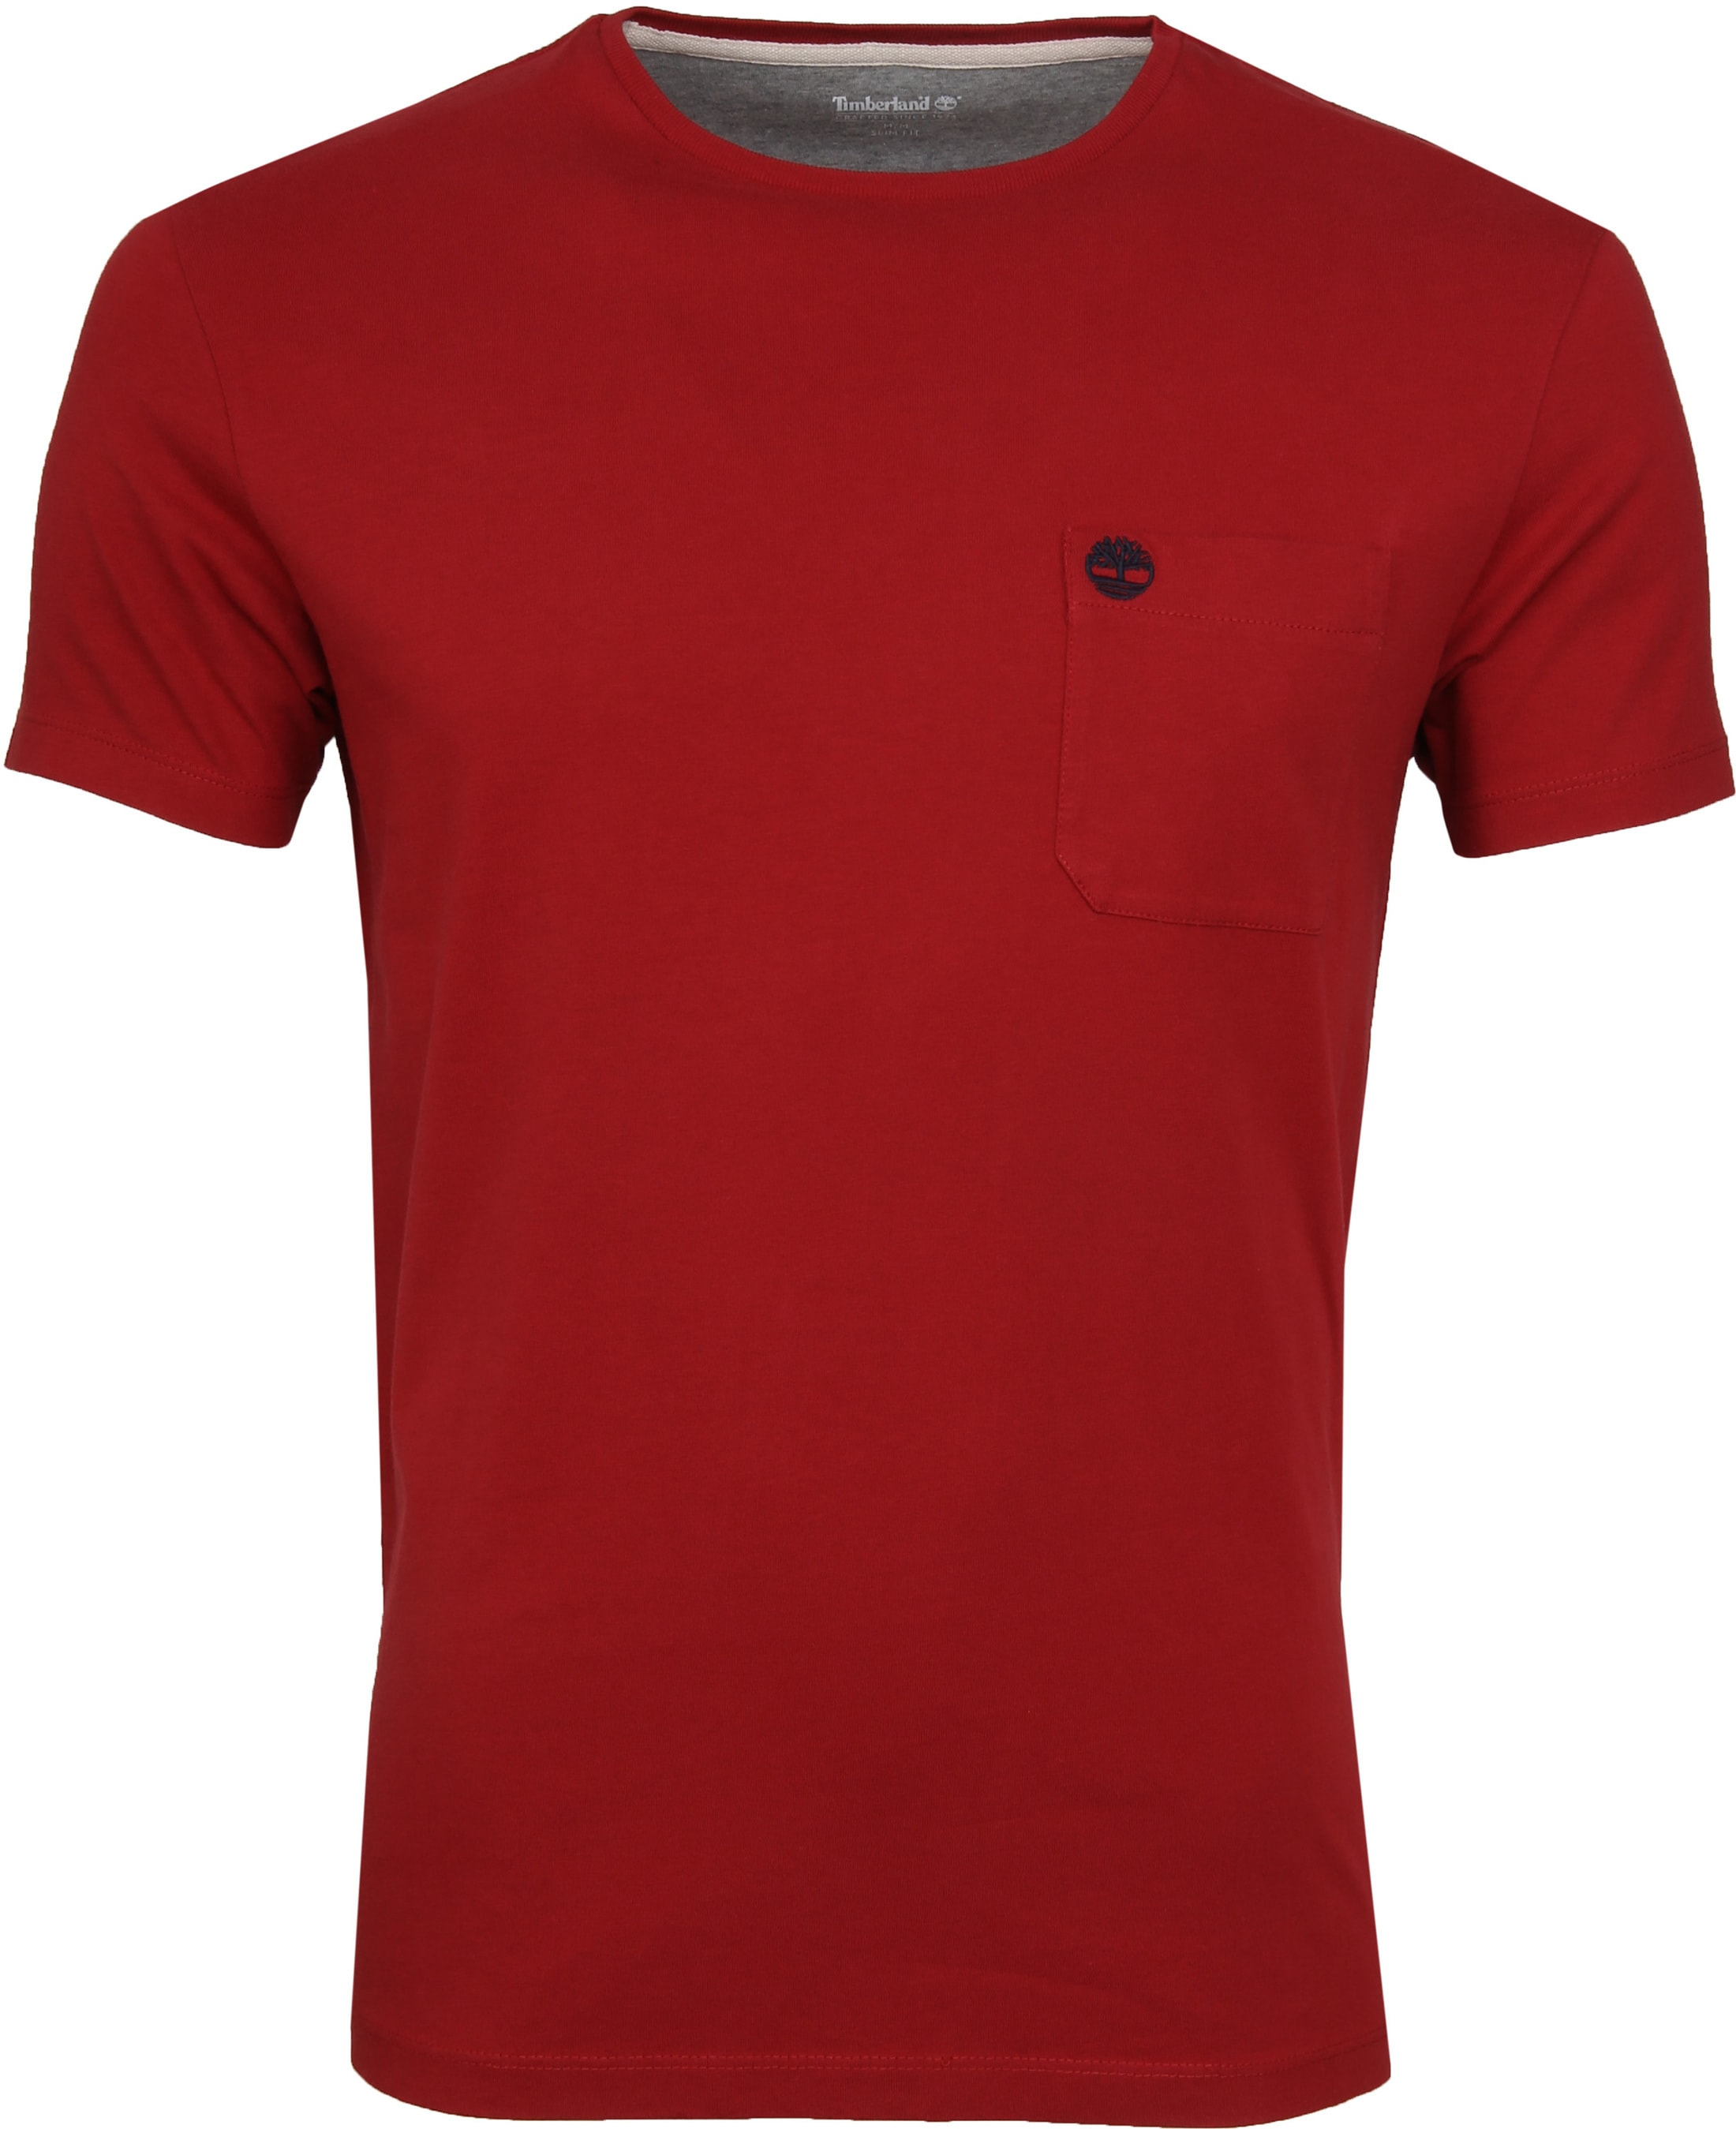 Timberland Dunstan T-shirt Rood foto 0